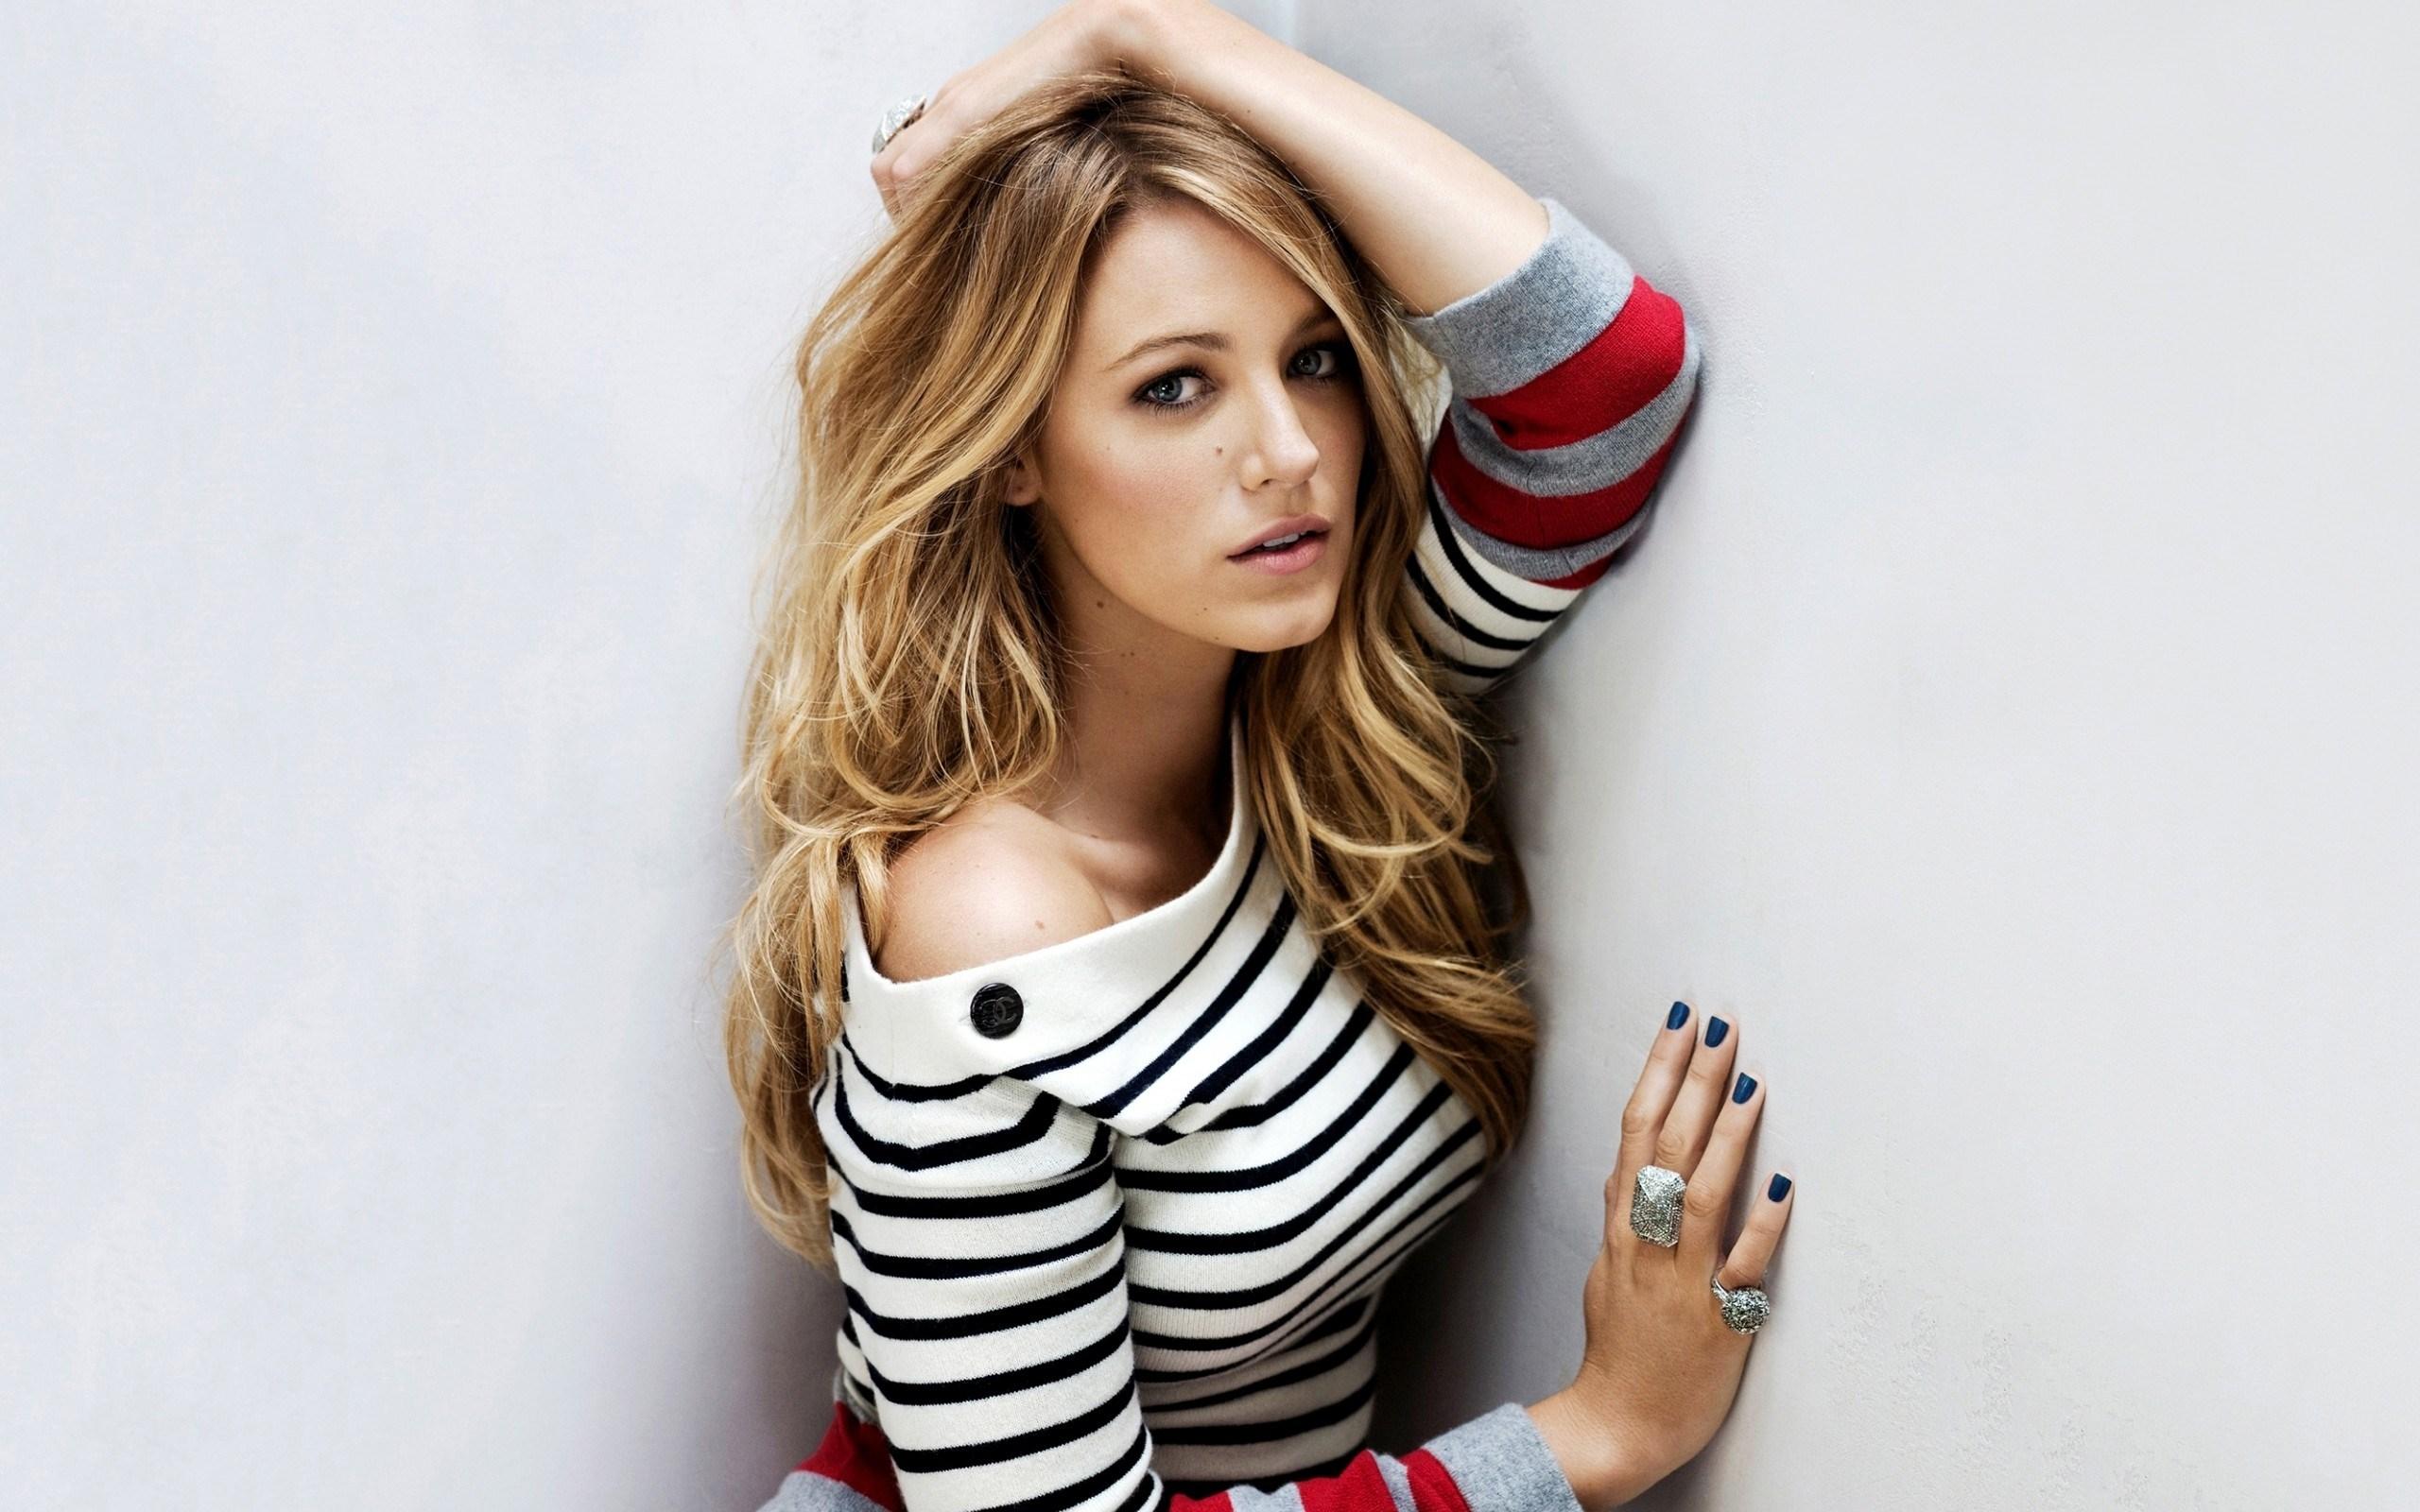 Pretty Blake Lively in striped sweater HD wallpaper 2560x1600 ...